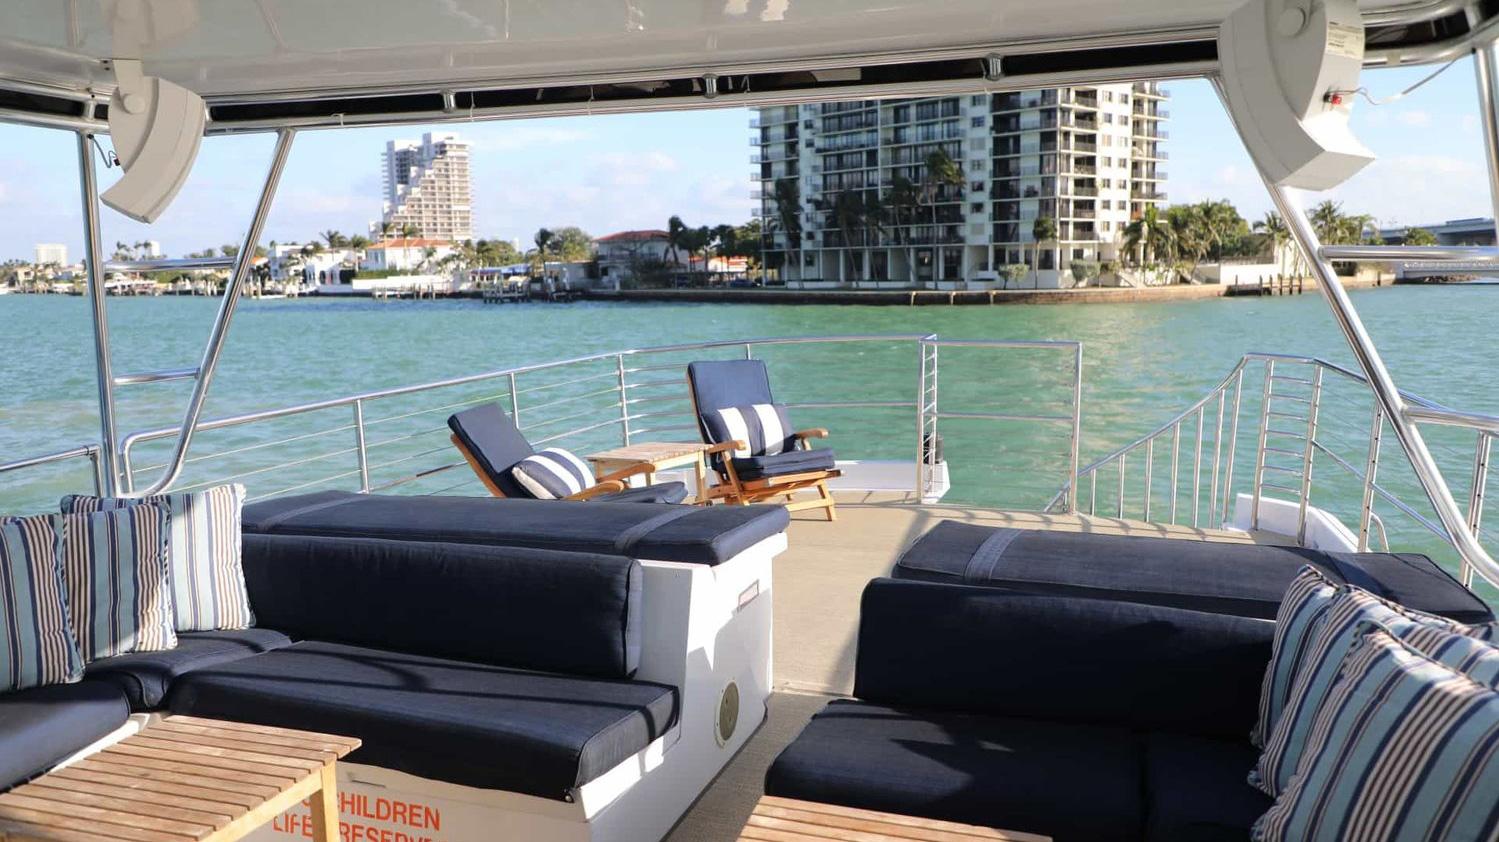 80ft Solstice Luxury Yacht